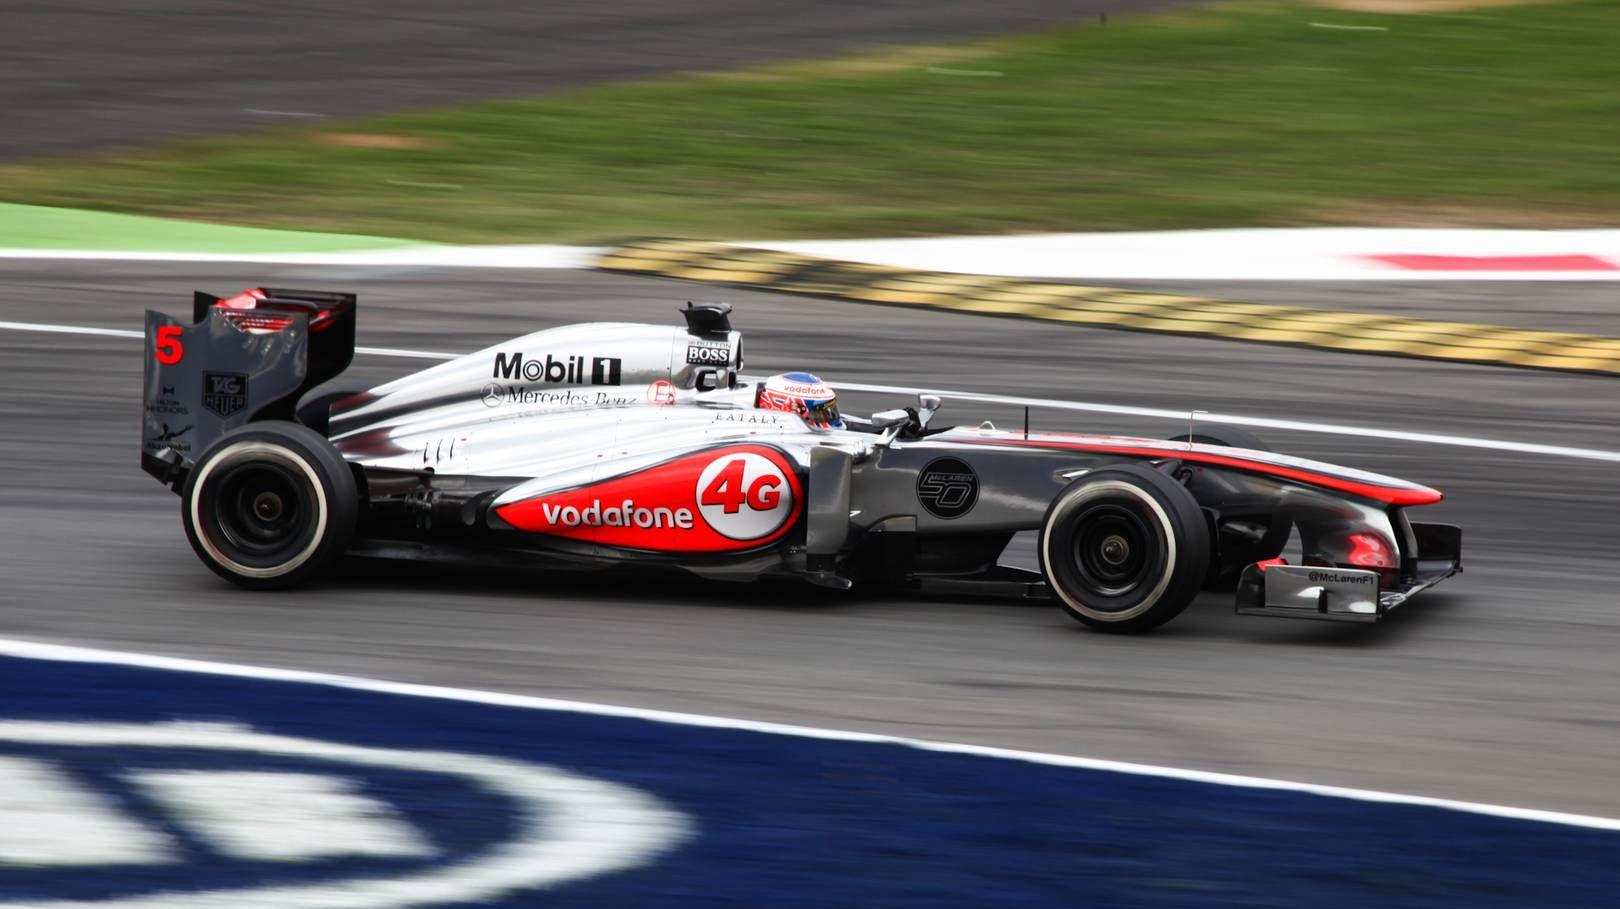 Дженсон Баттон за рулем болида McLaren